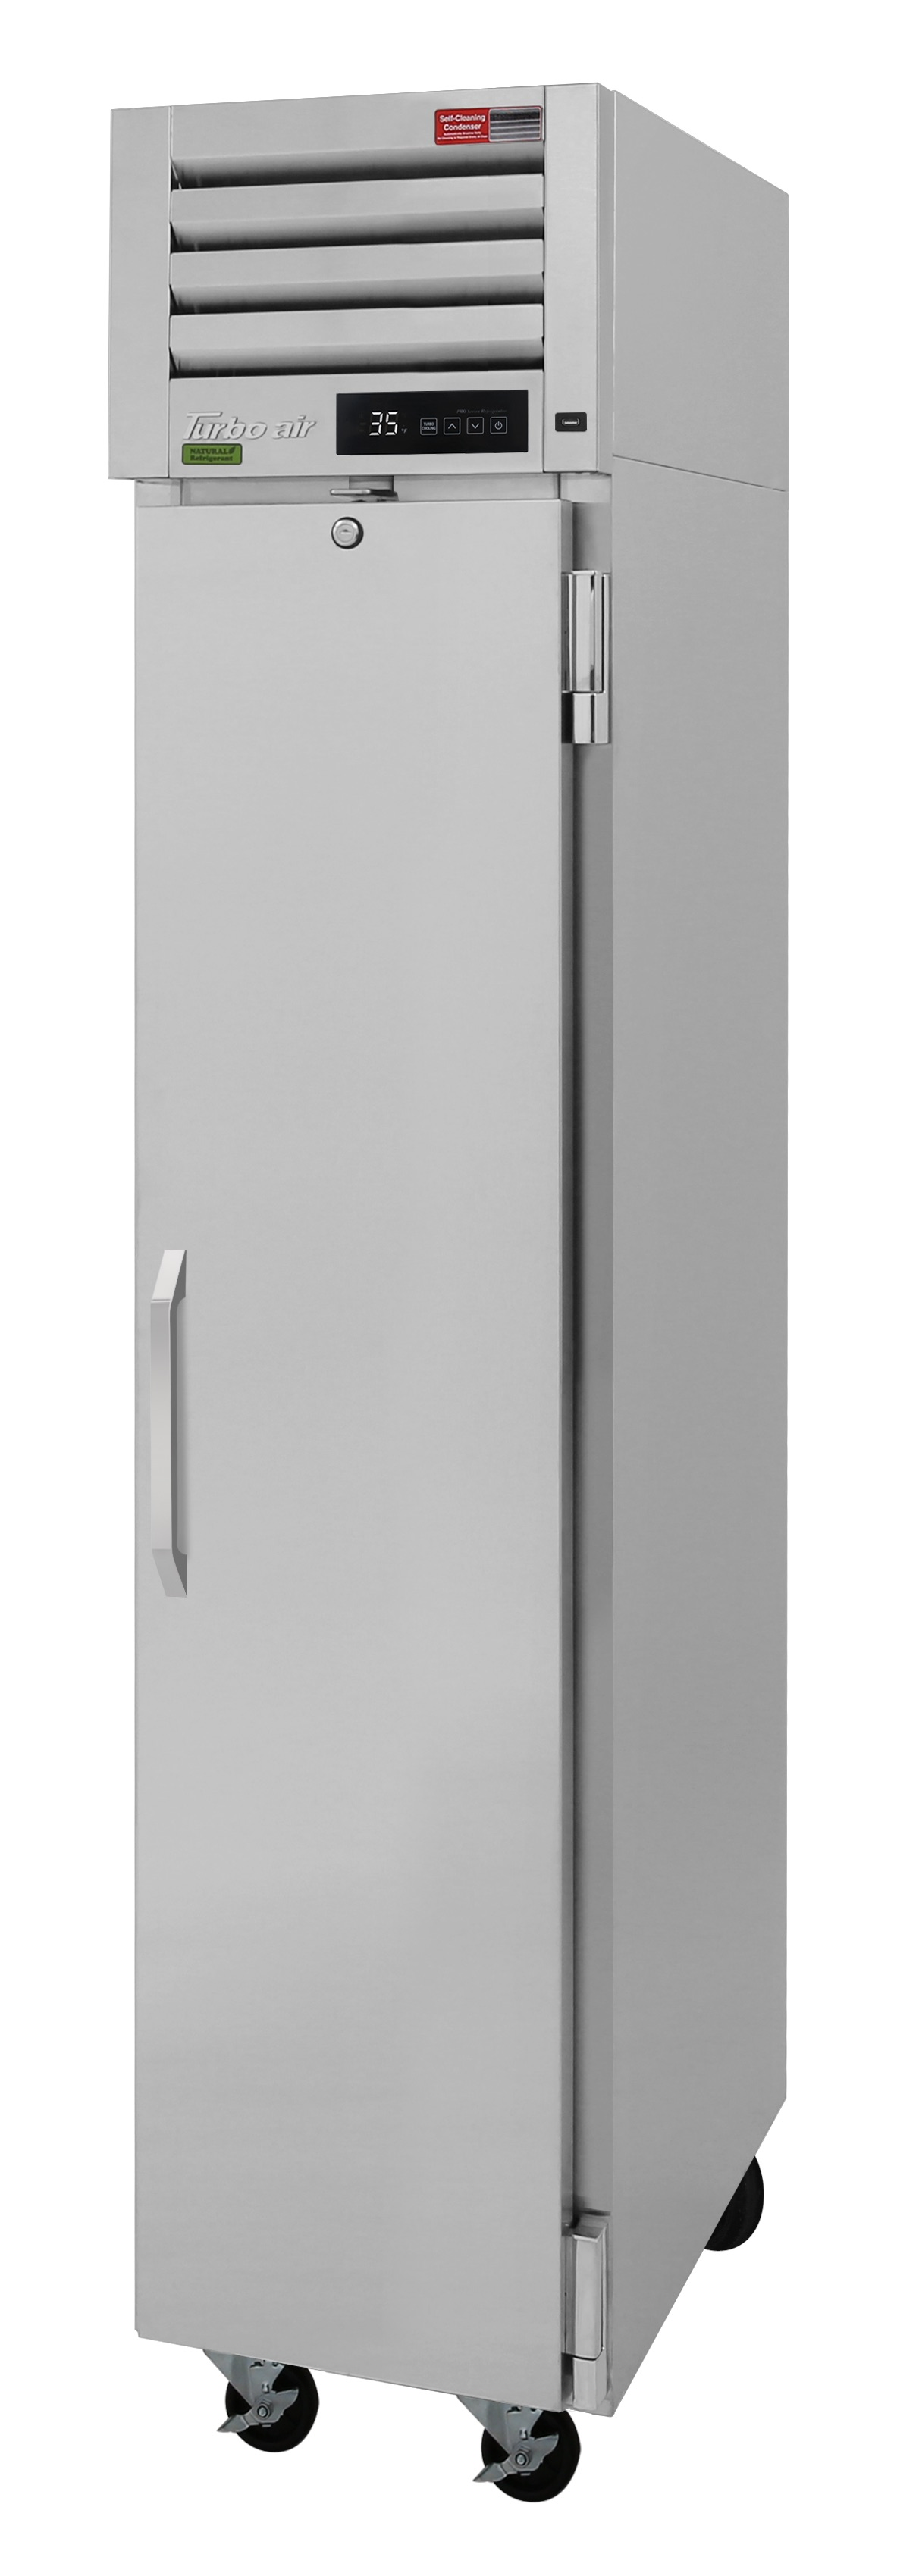 Turbo Air PRO-12-2R-N pro series - reach in refrigerator